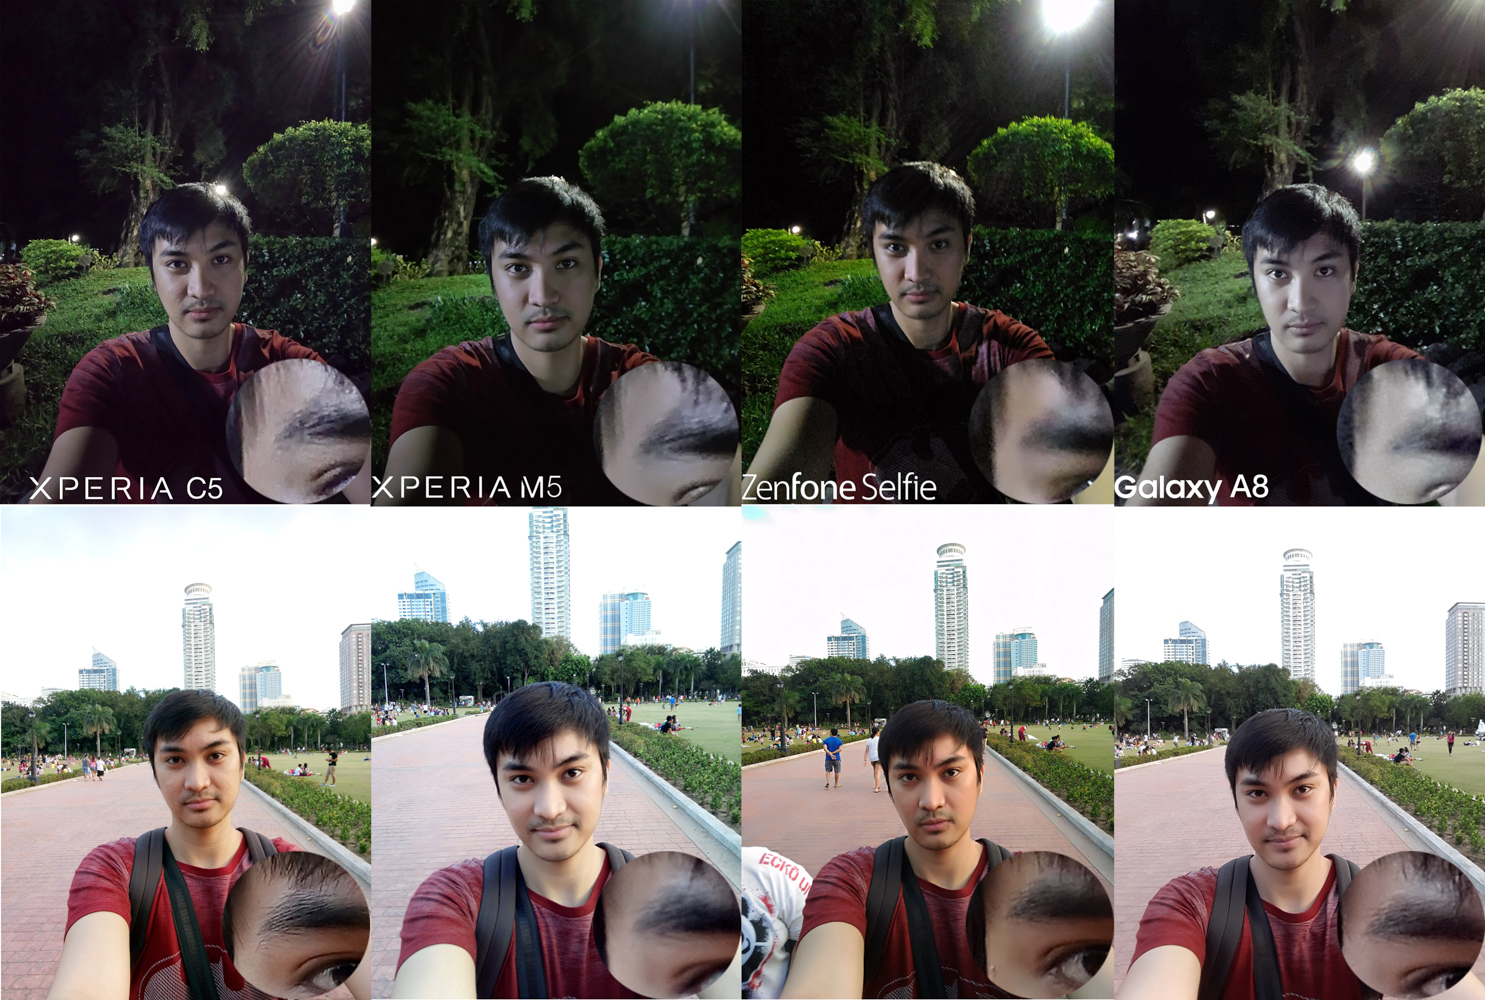 Selfie Front Camera Battle Xperia M5 C5 Ultra Sony Samsung Galaxy A8 Asus Zenfone Selfie